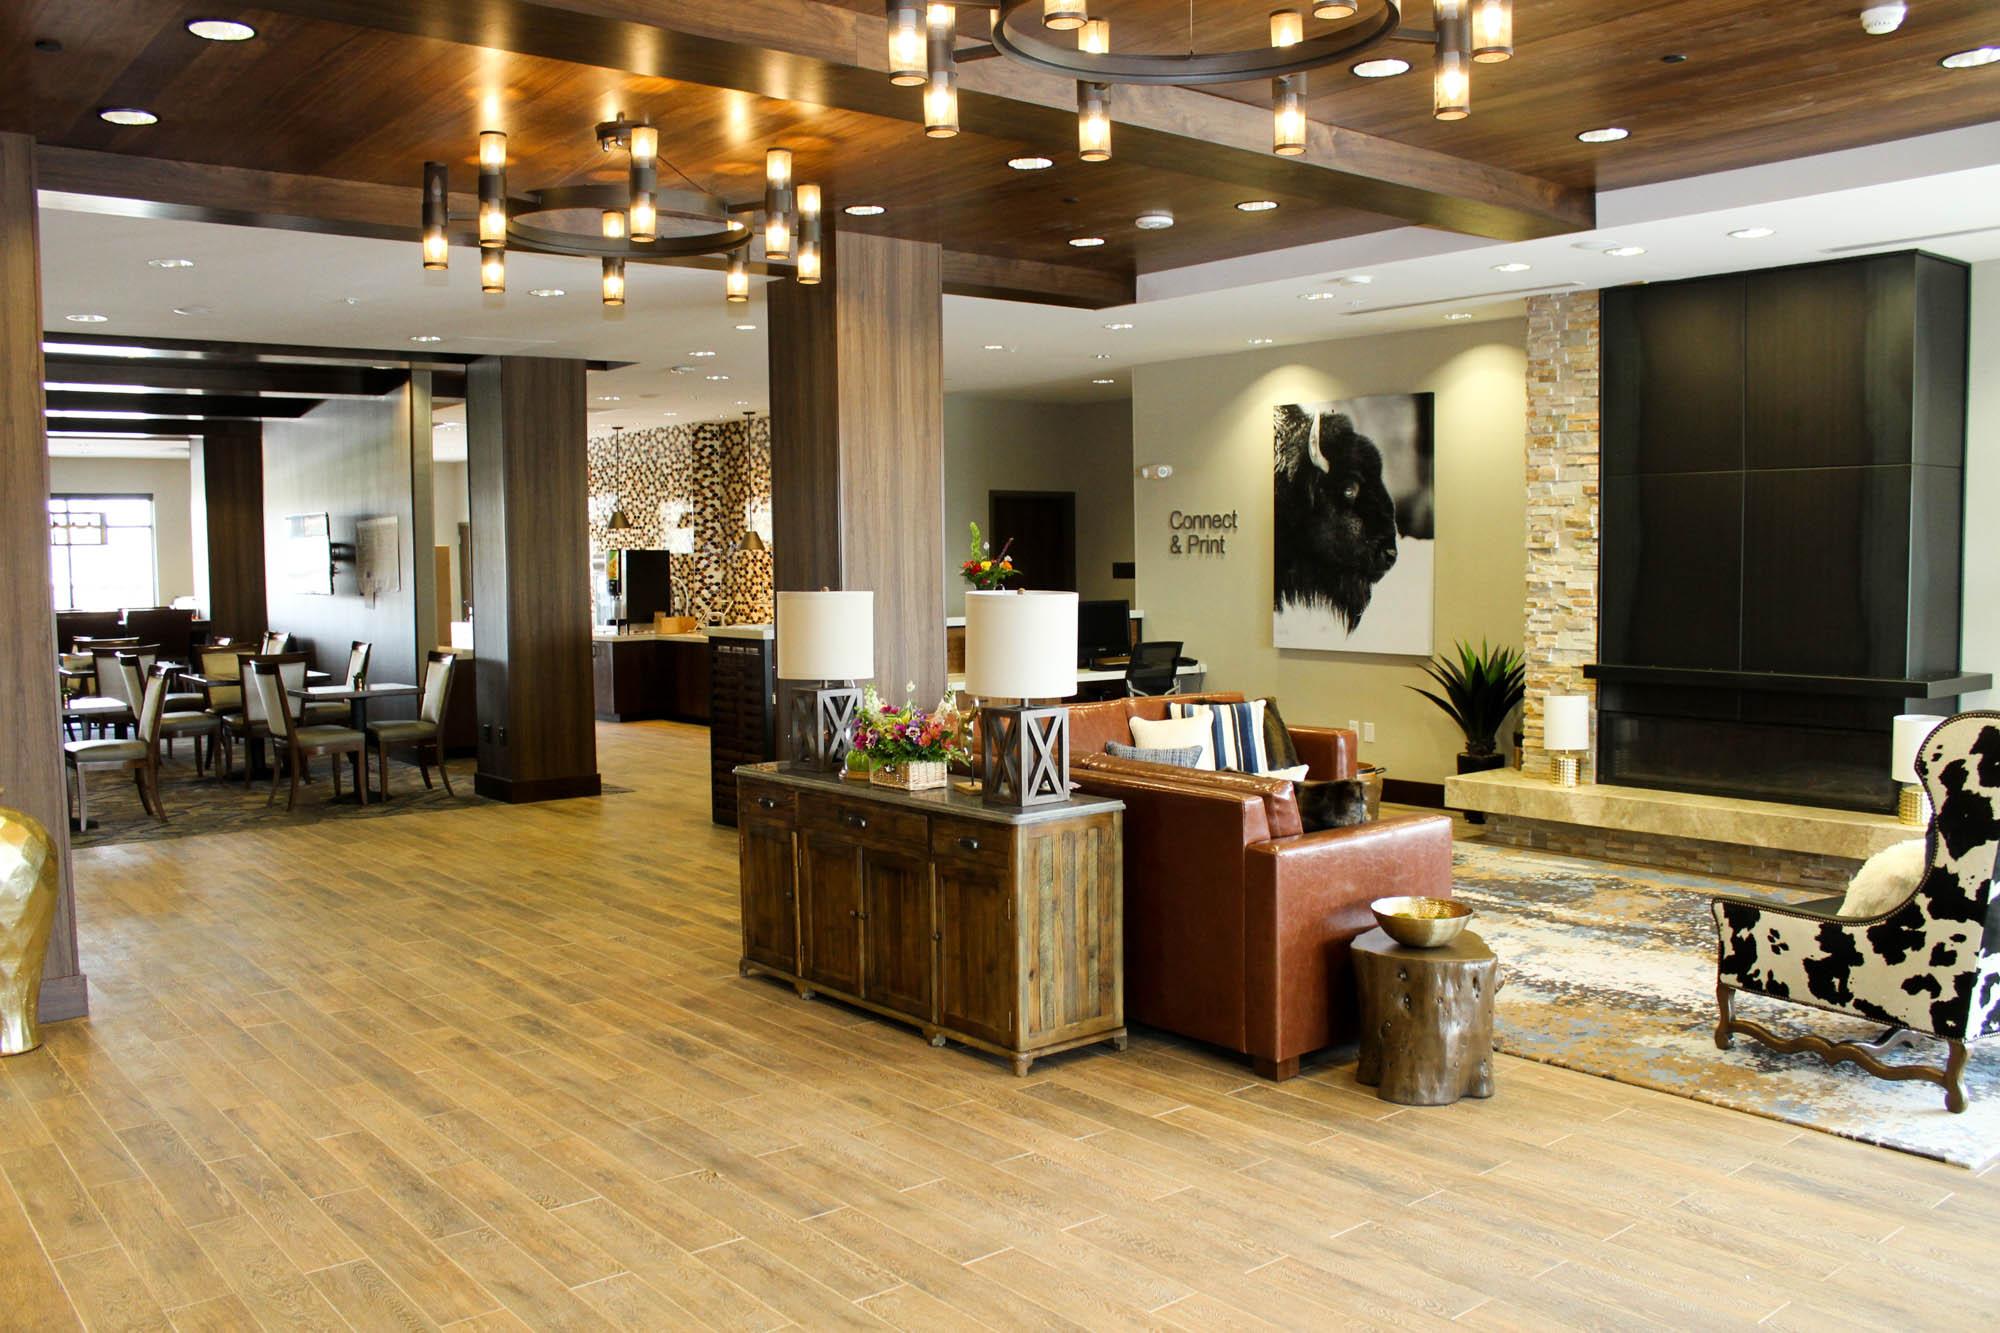 Fairfield Inn & Suites Cheyenne Southwest/Downtown Area